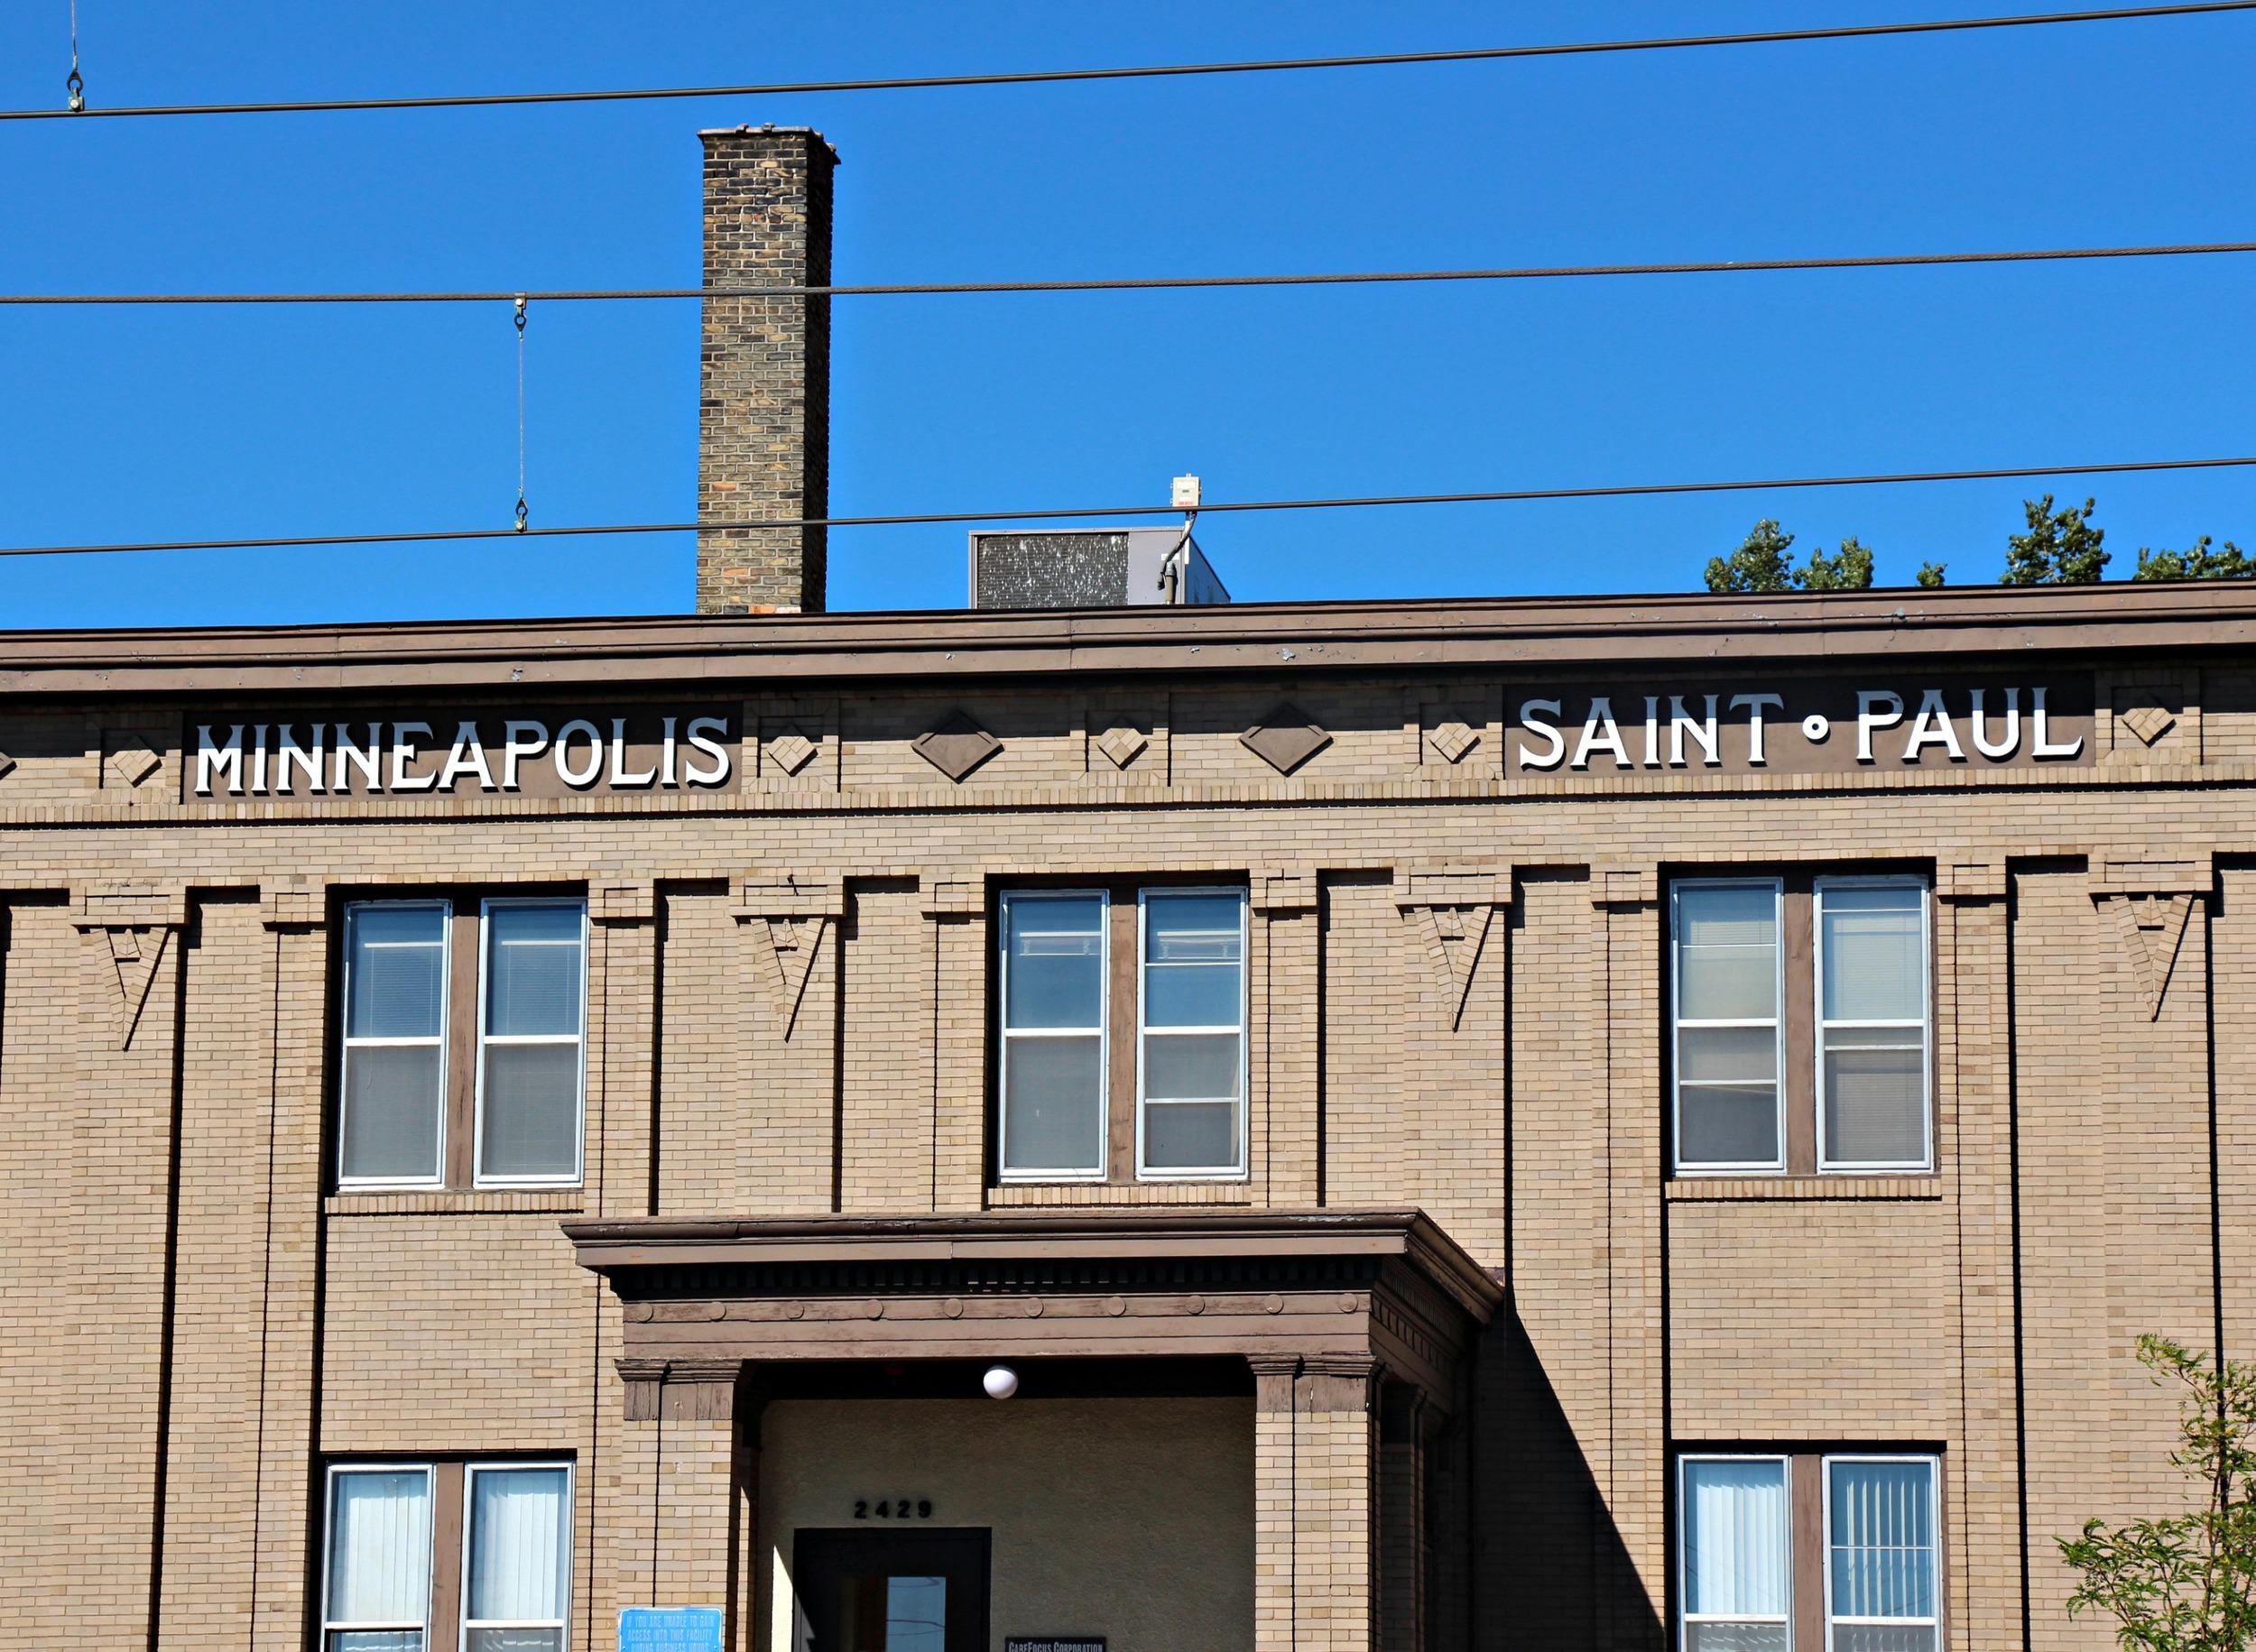 The Minneapolis-Saint Paul Building, Built in 1909